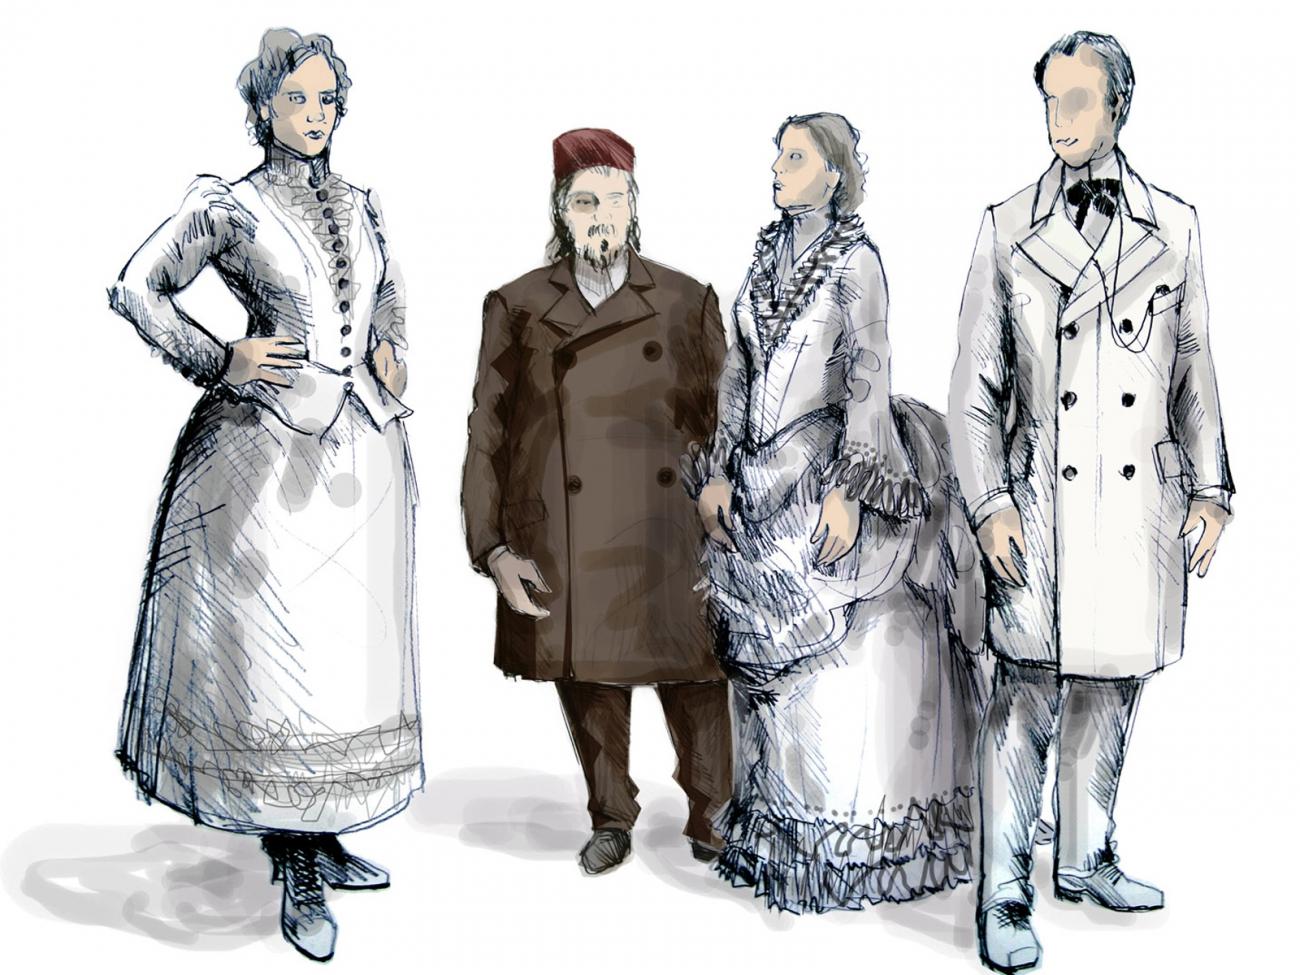 Kostueme-Costumes-Costumedesign- Bernhard Duss